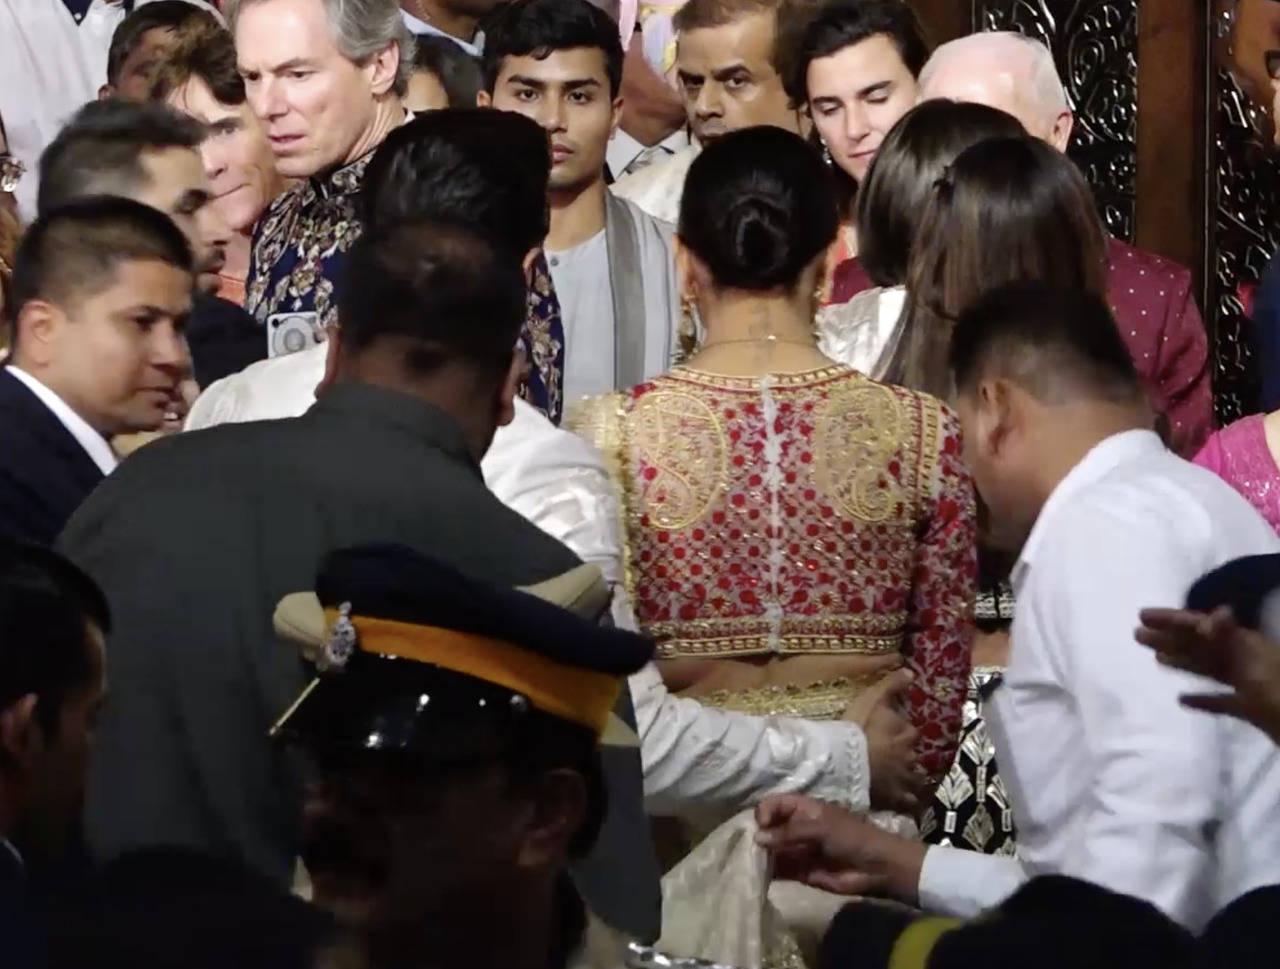 Deepika Padukone RK tattoo photos at Isha Ambani and Anand Piramal wedding